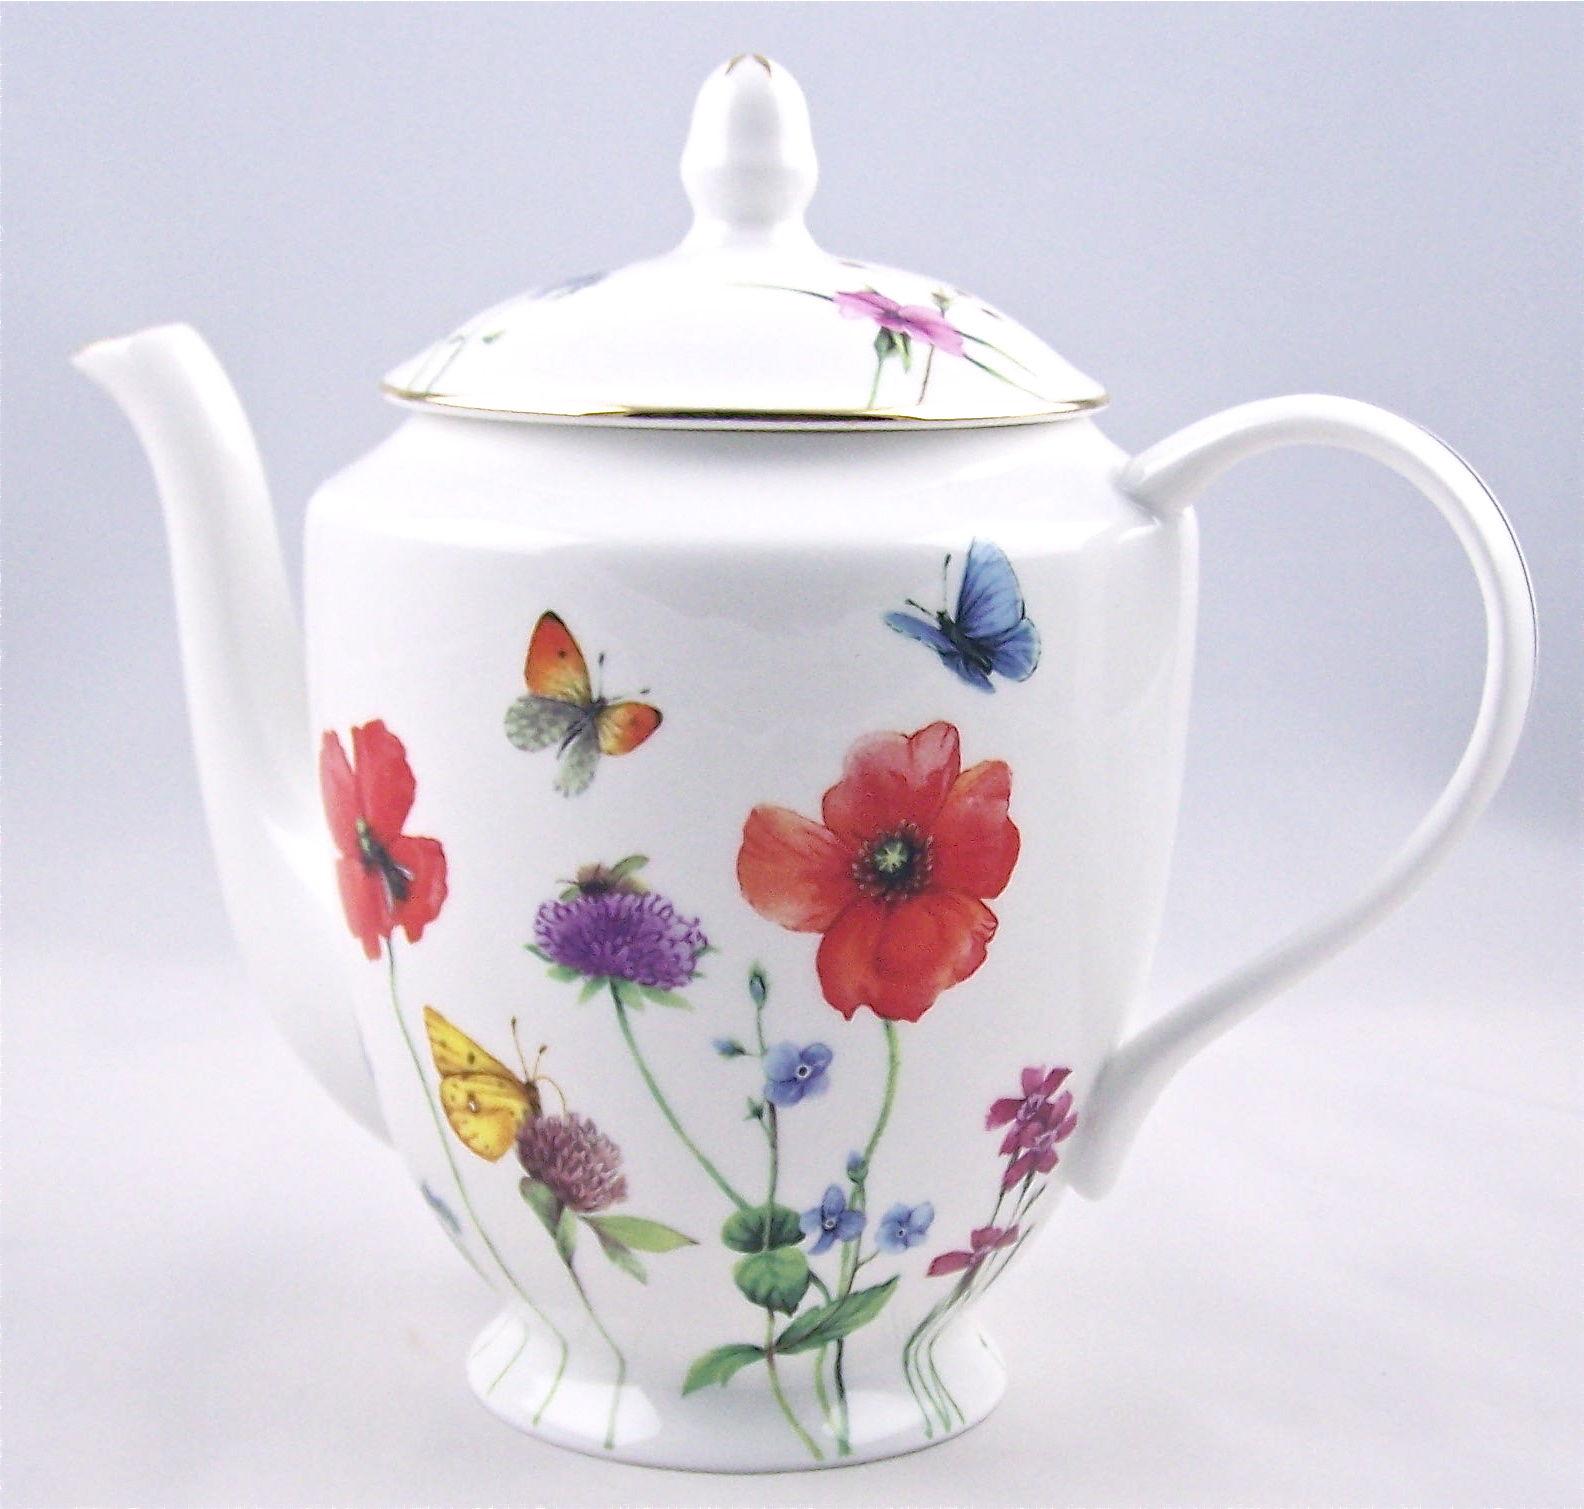 Fine Bone China 6 Cup Teapot Meadow Flowers Chintz